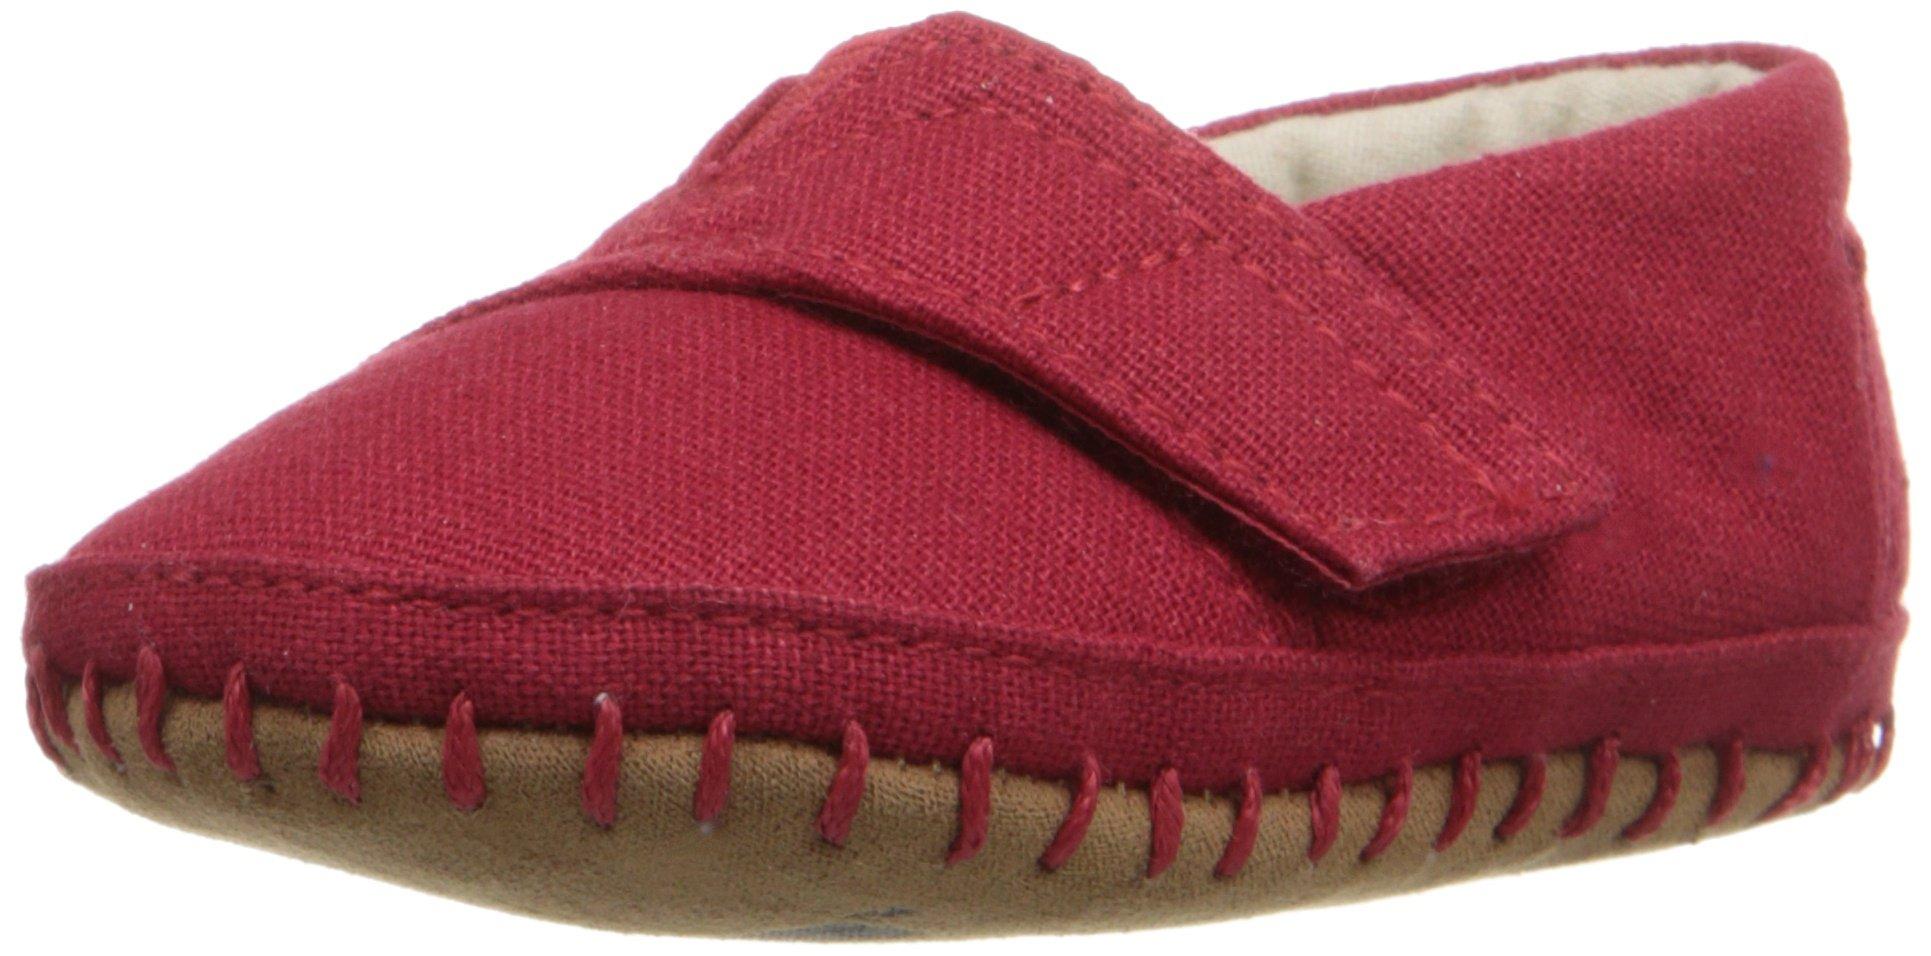 TOMS Unisex 10007646 Alpargata Crib Shoe, Red, 4 M US Toddler